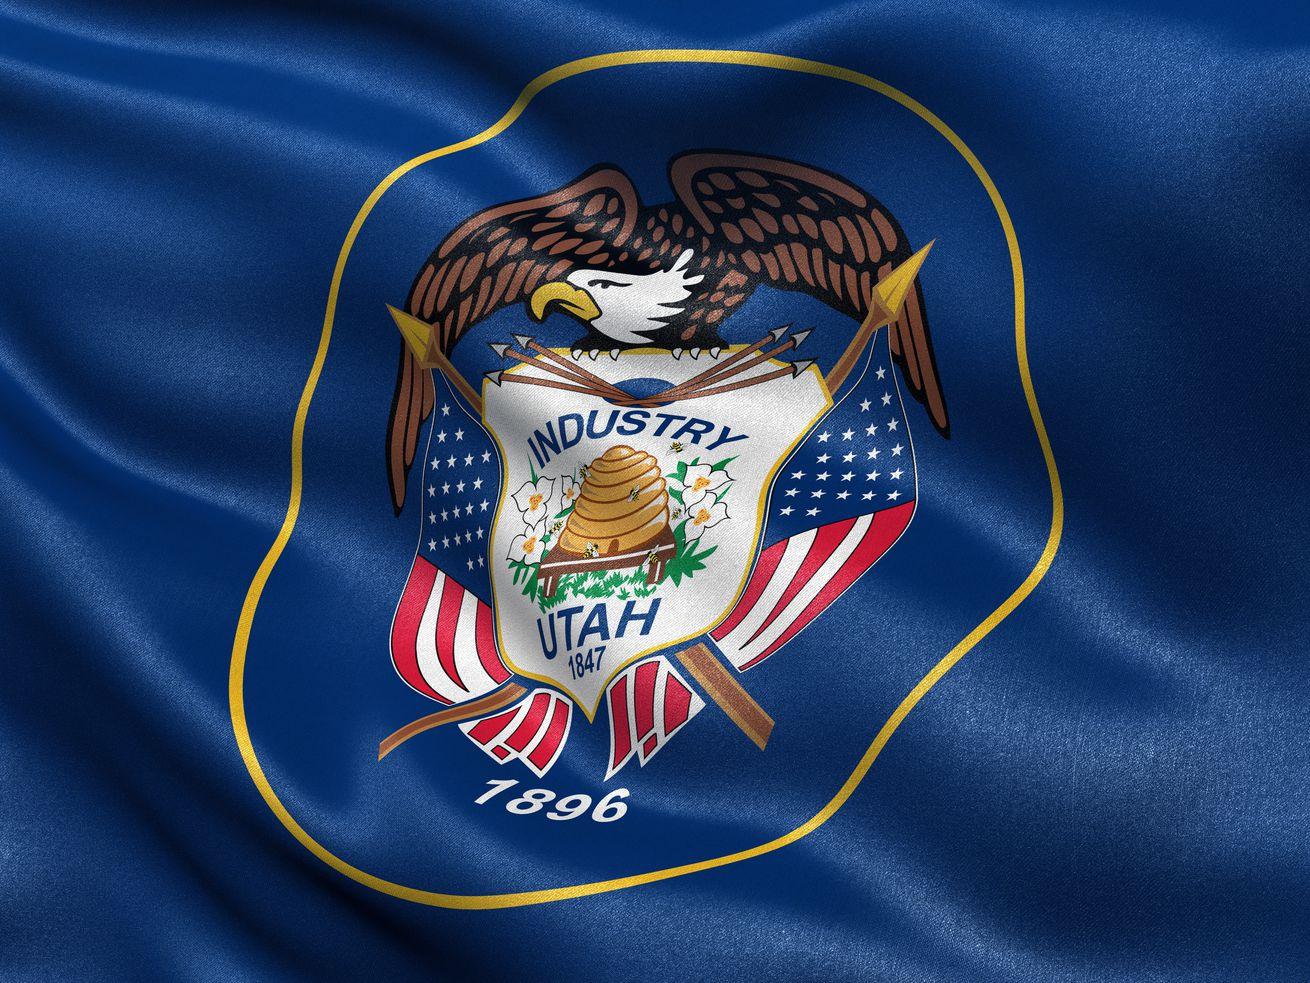 An image of a Utah flag